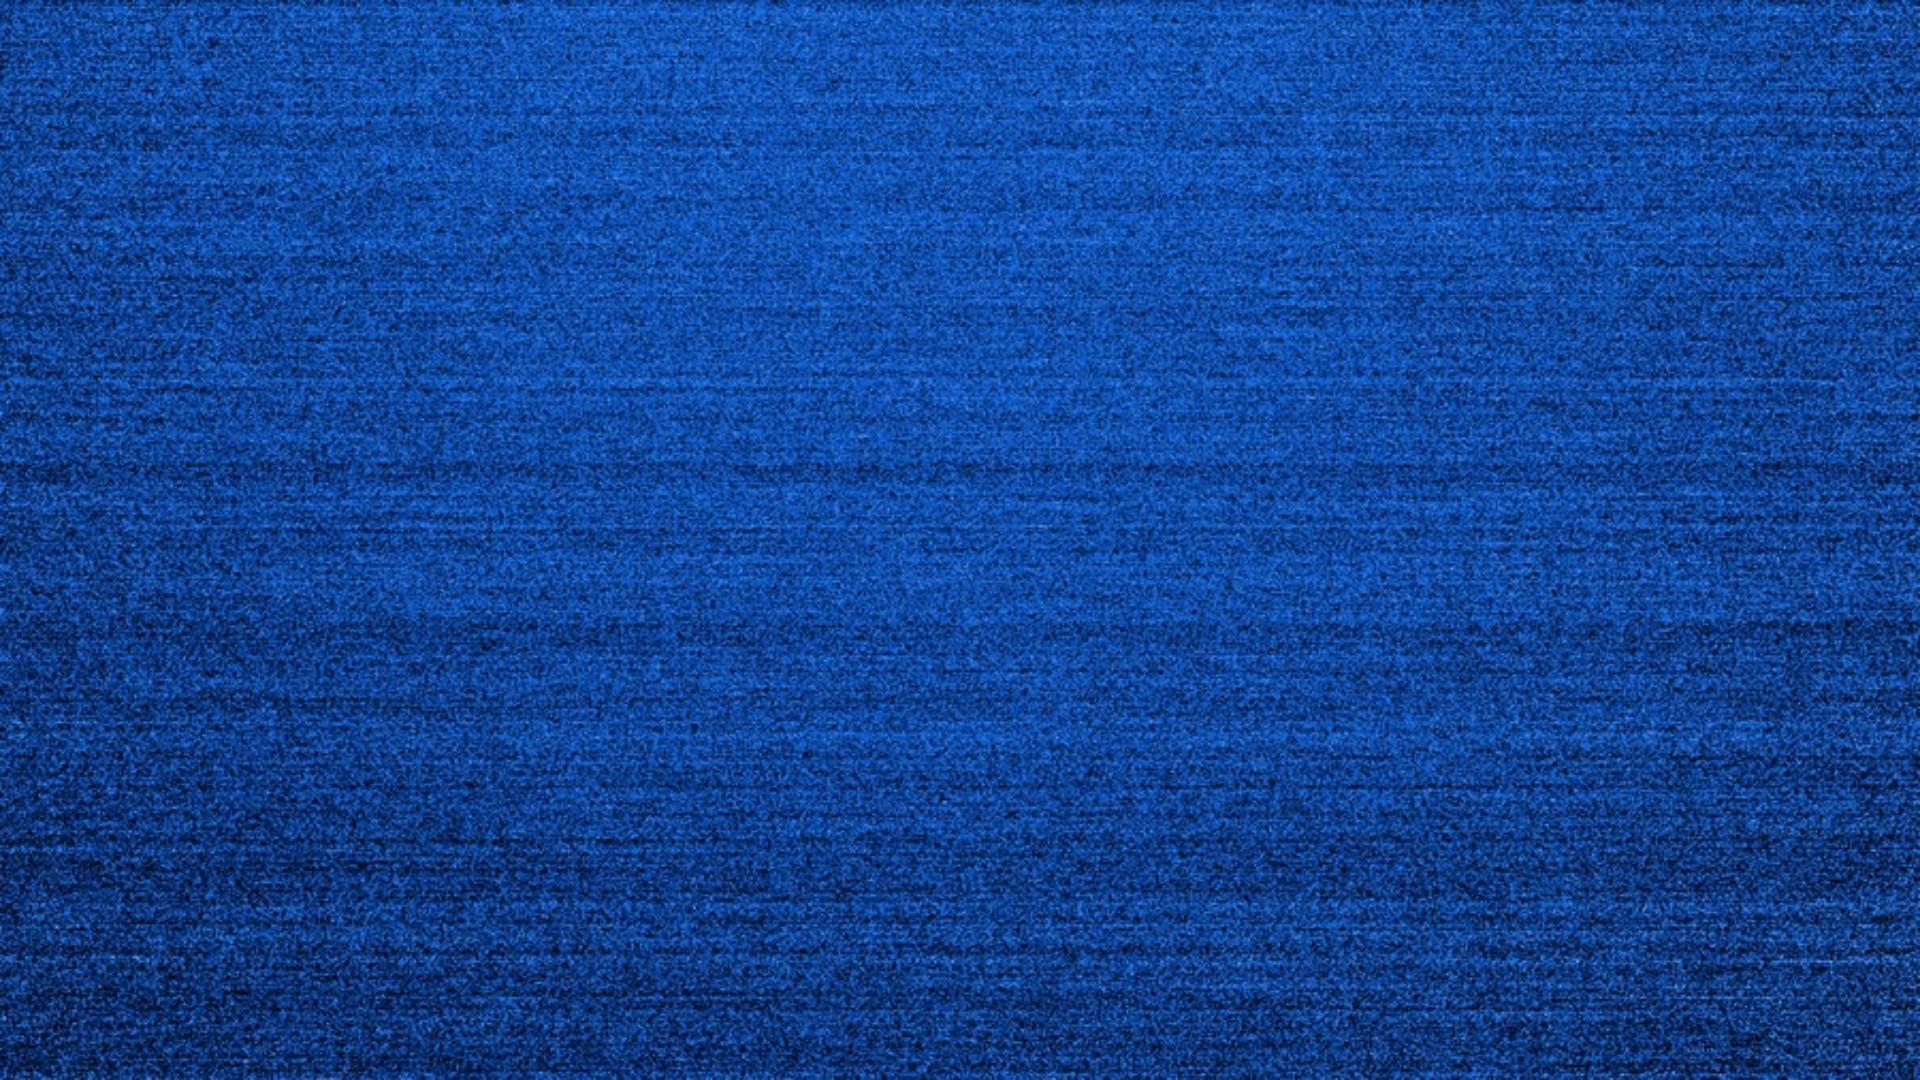 Line Texture Wallpaper : Dark blue background wallpaper images